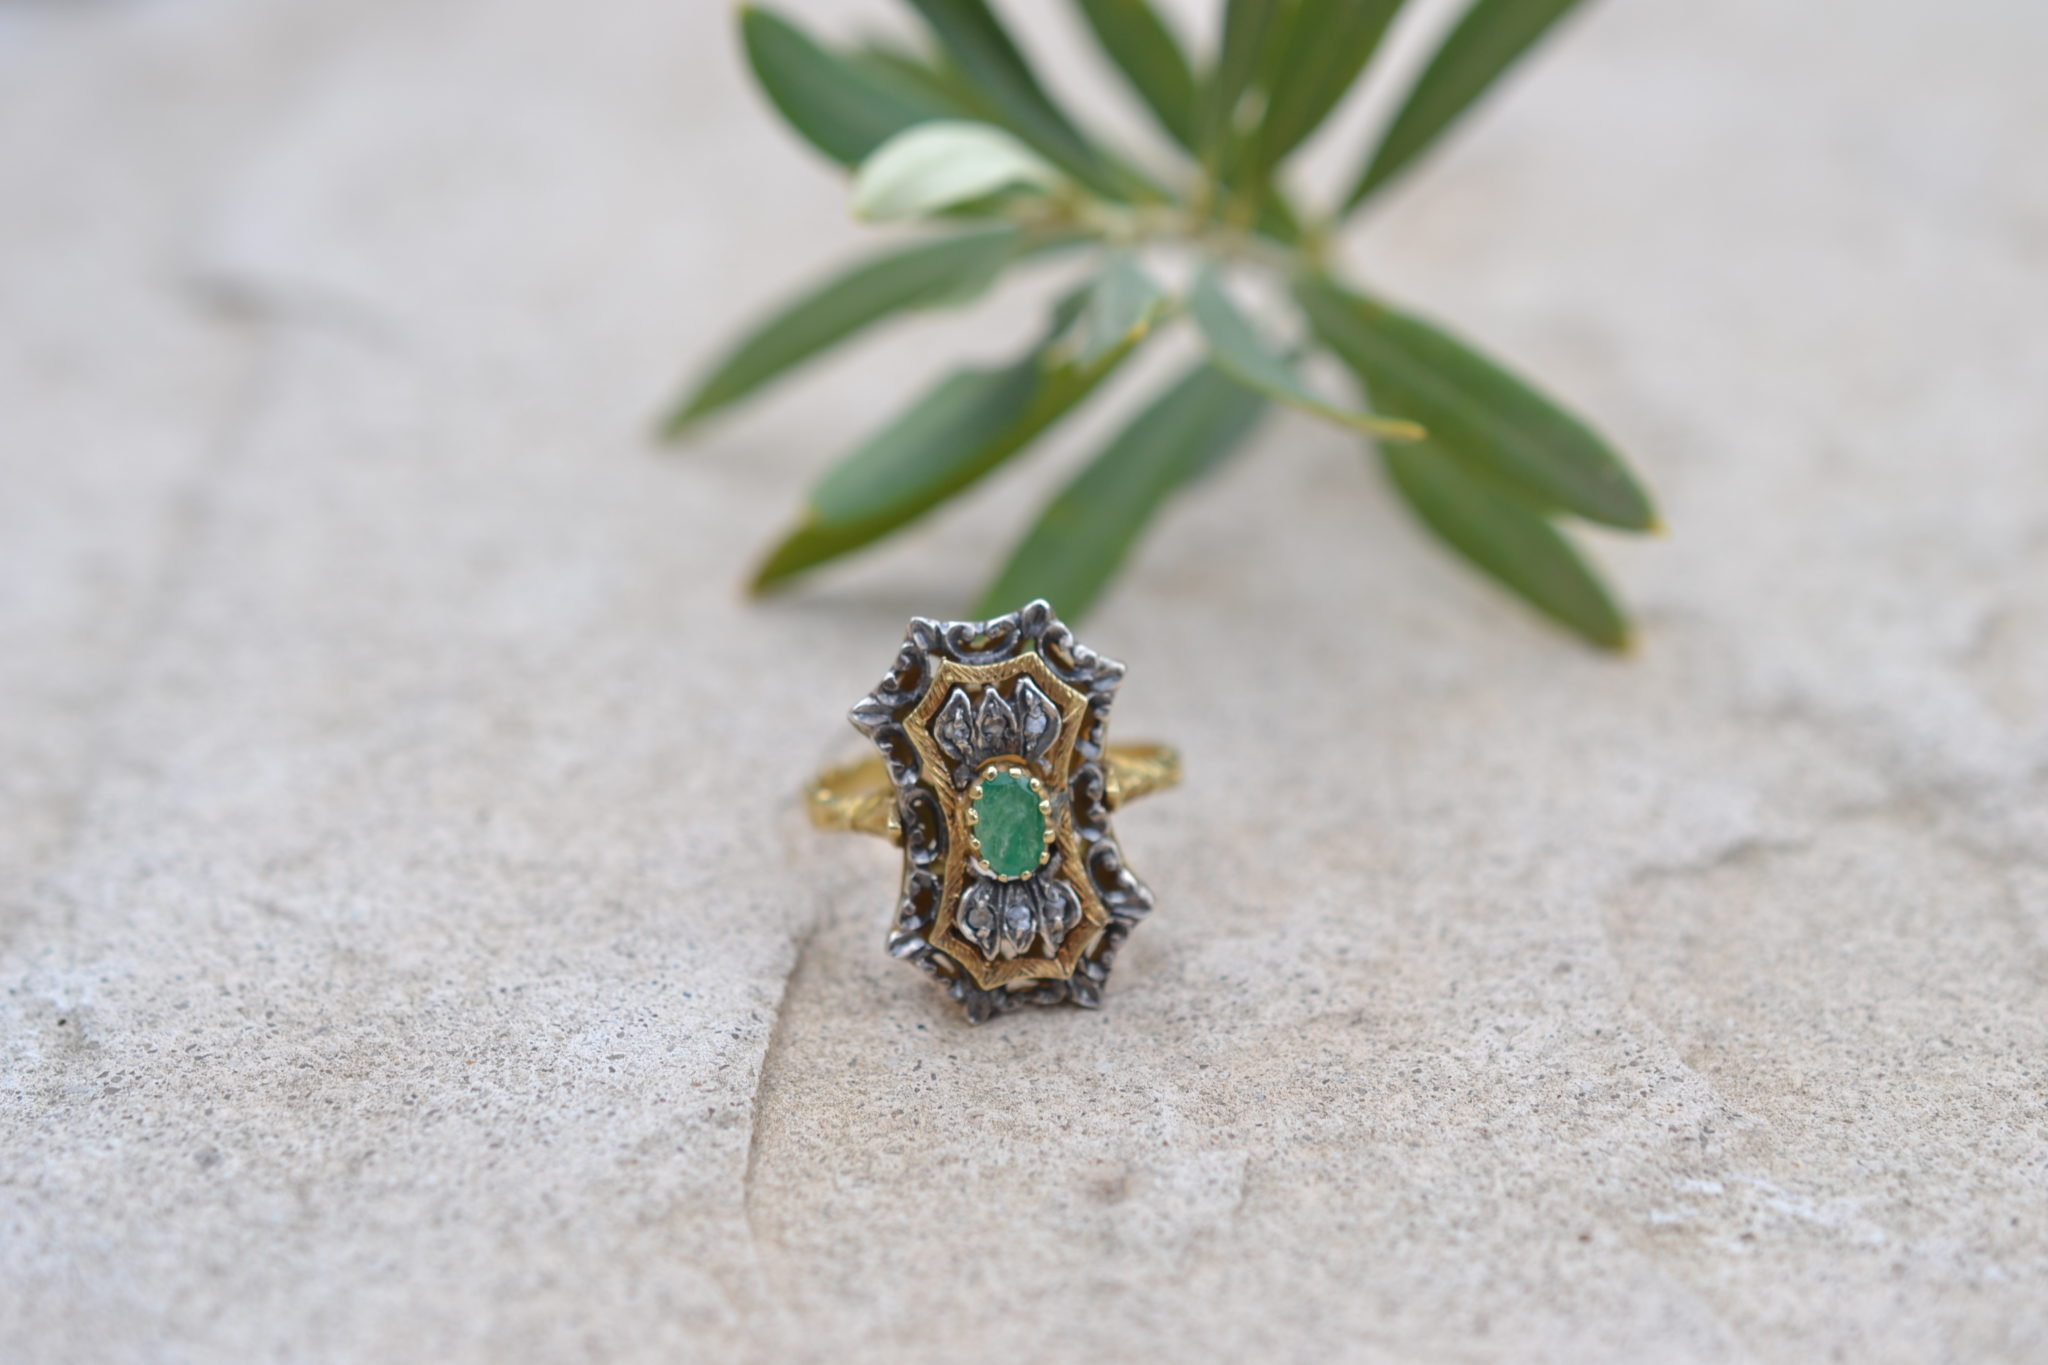 bague ancienne emeraude et diamants - en Or jaune 18 carats - bijoux inde